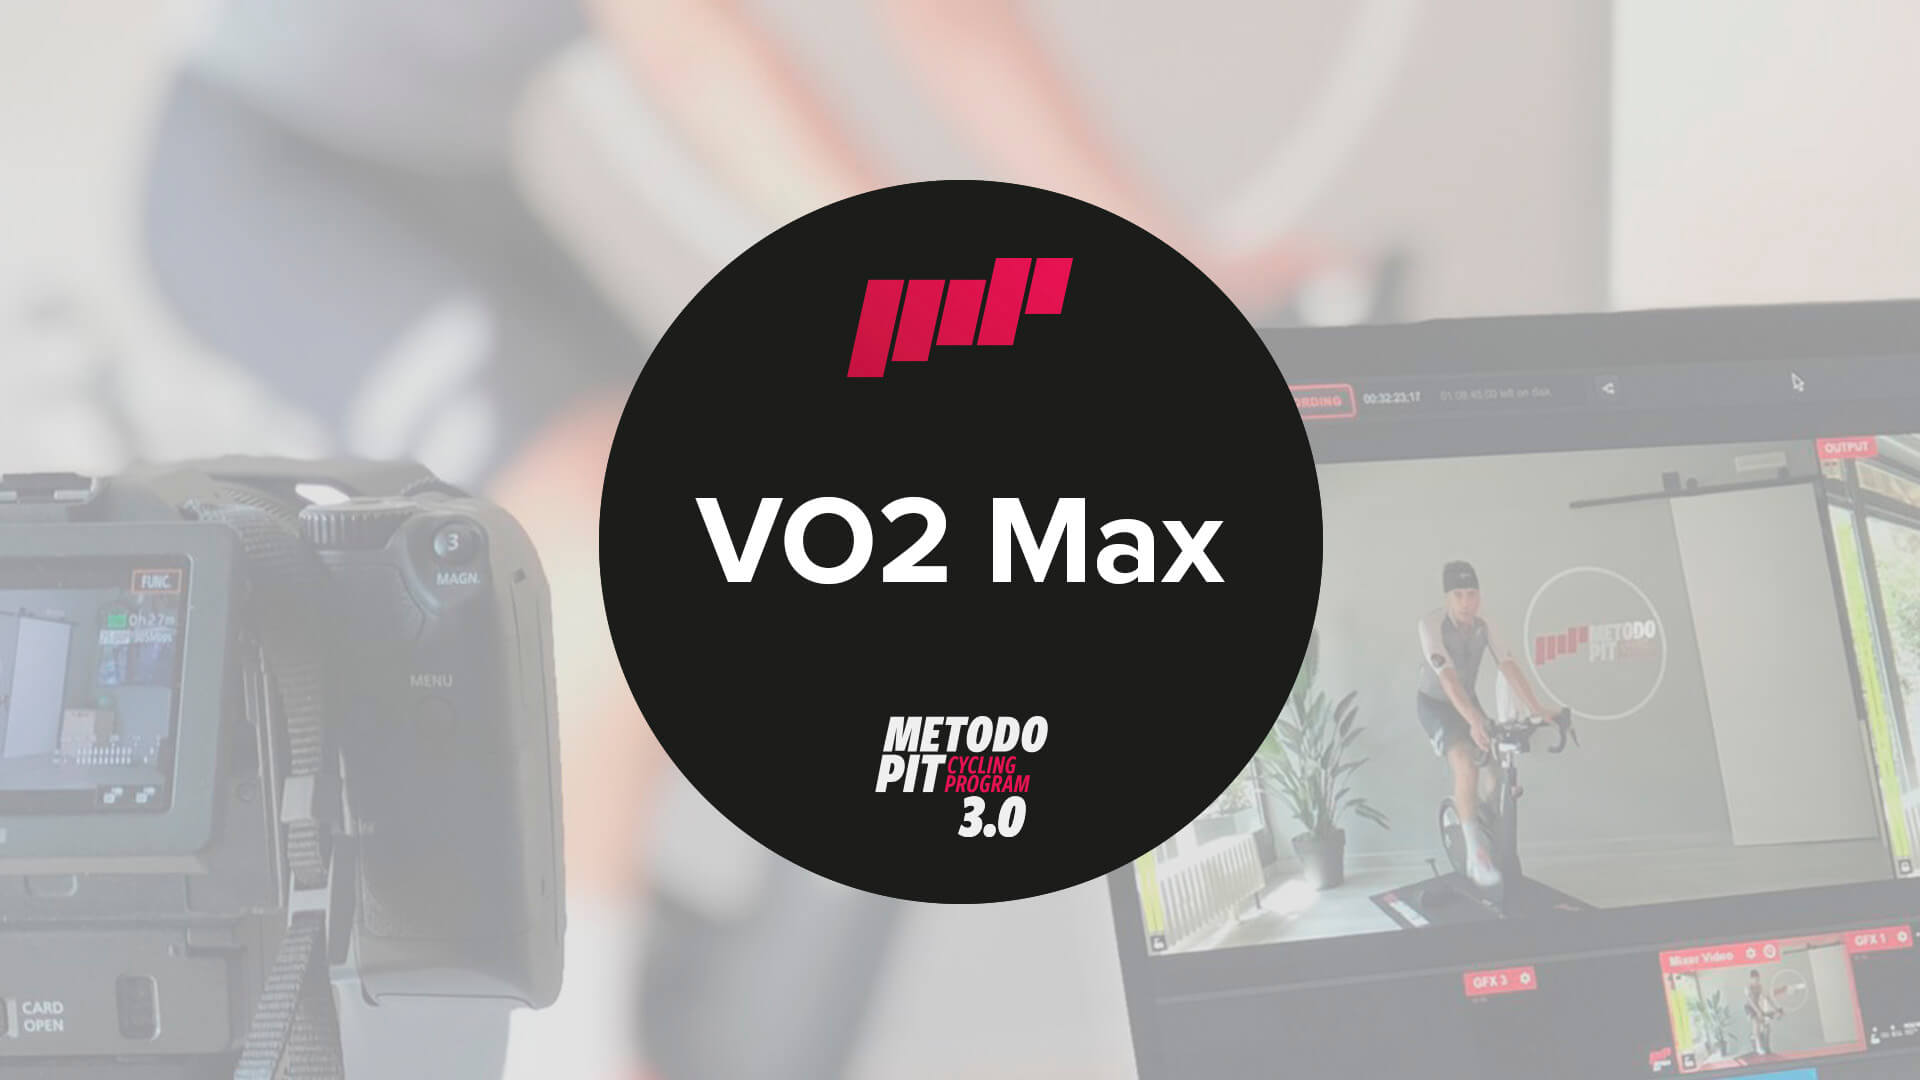 Metodo Pit 3.0 VO2 Max